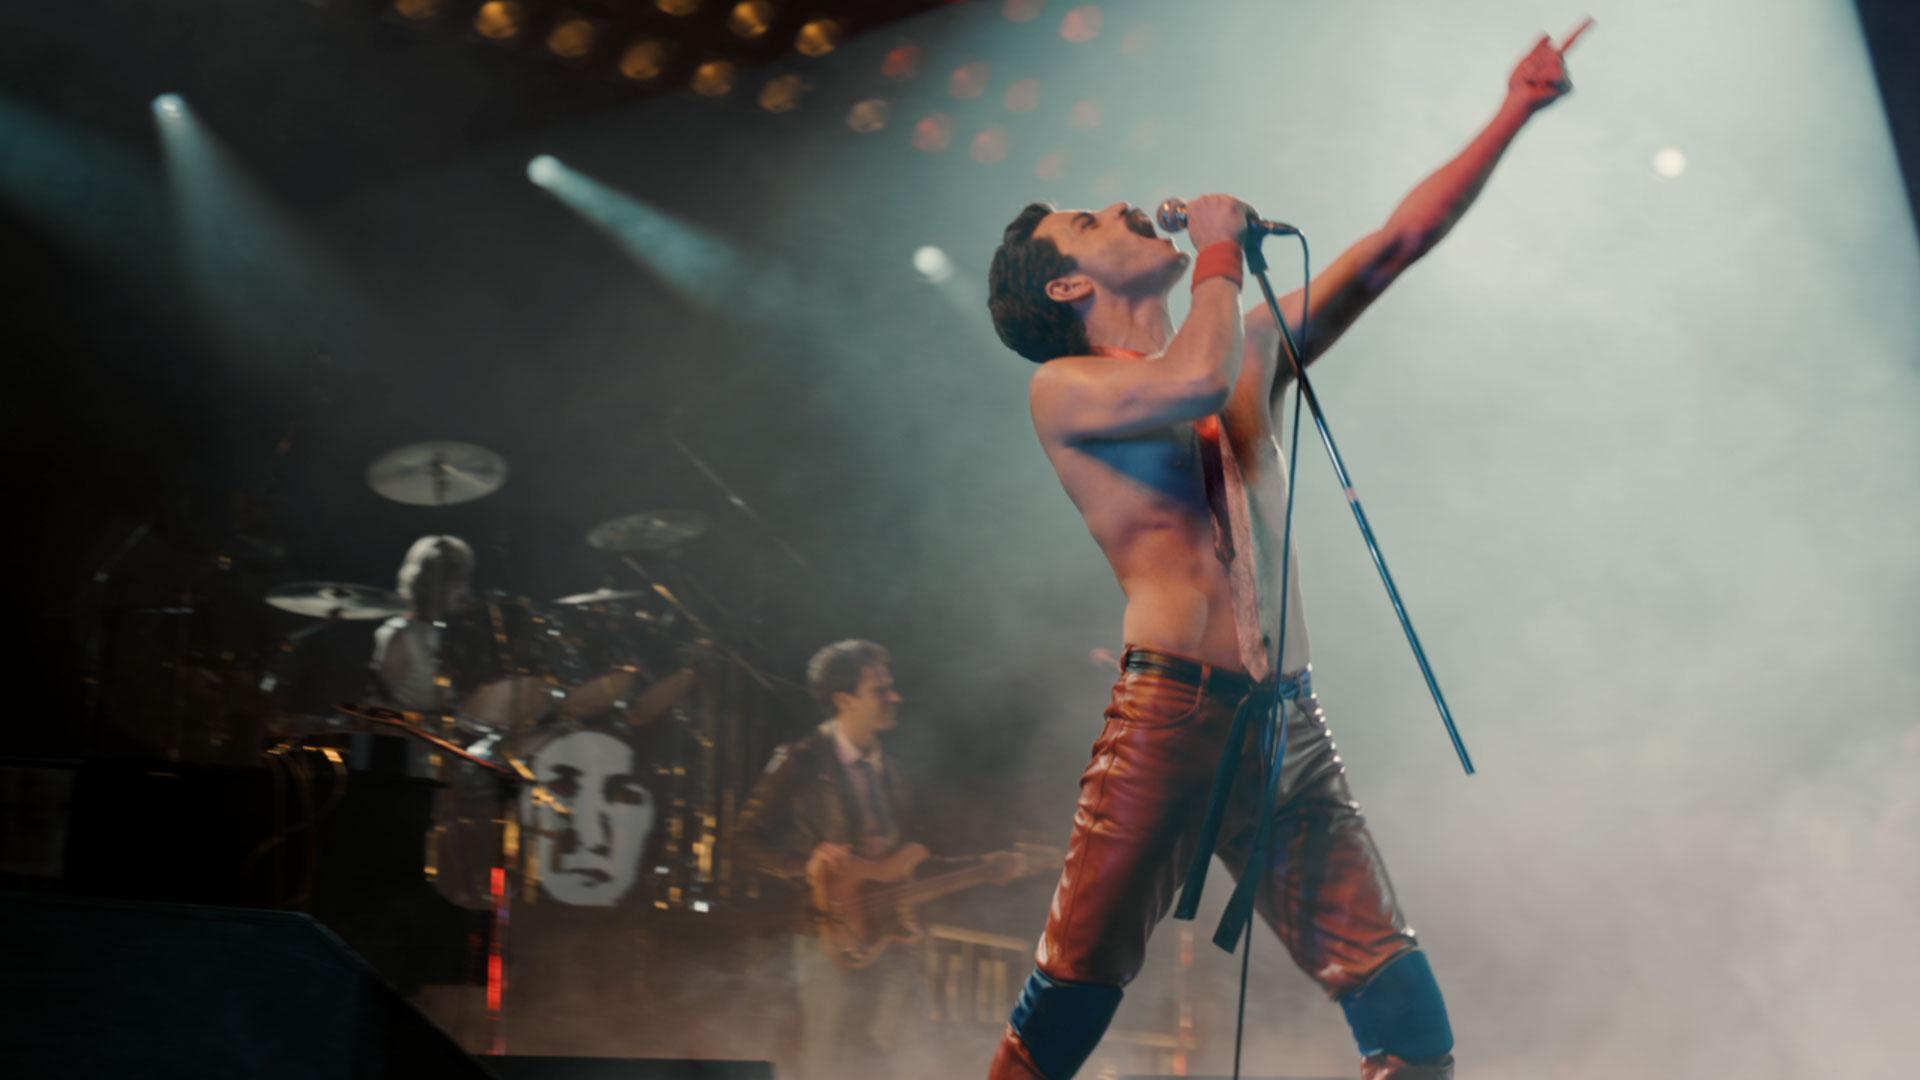 Rami Malek snags a Golden Globe for his role in Bohemian Rhapsody